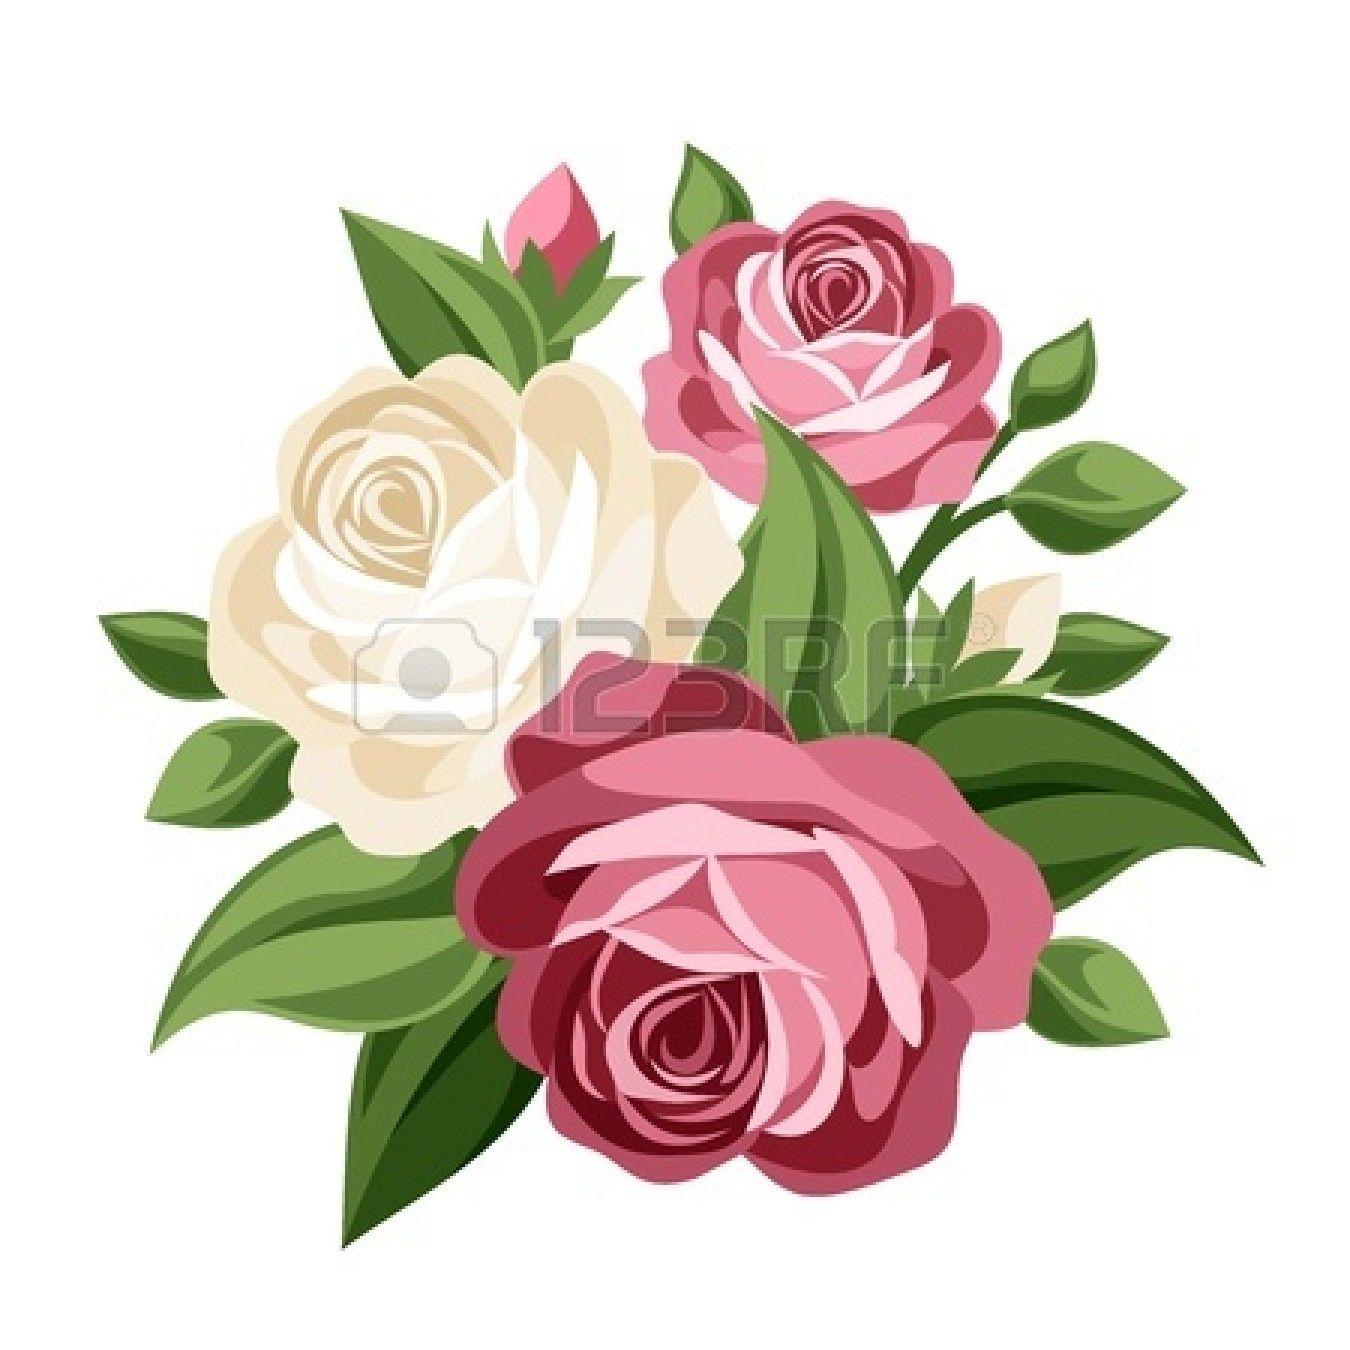 Rose Bouquet Clip Art Black And White Clipart Panda Free Clipart Images Vector Flowers Flower Art Flower Clipart